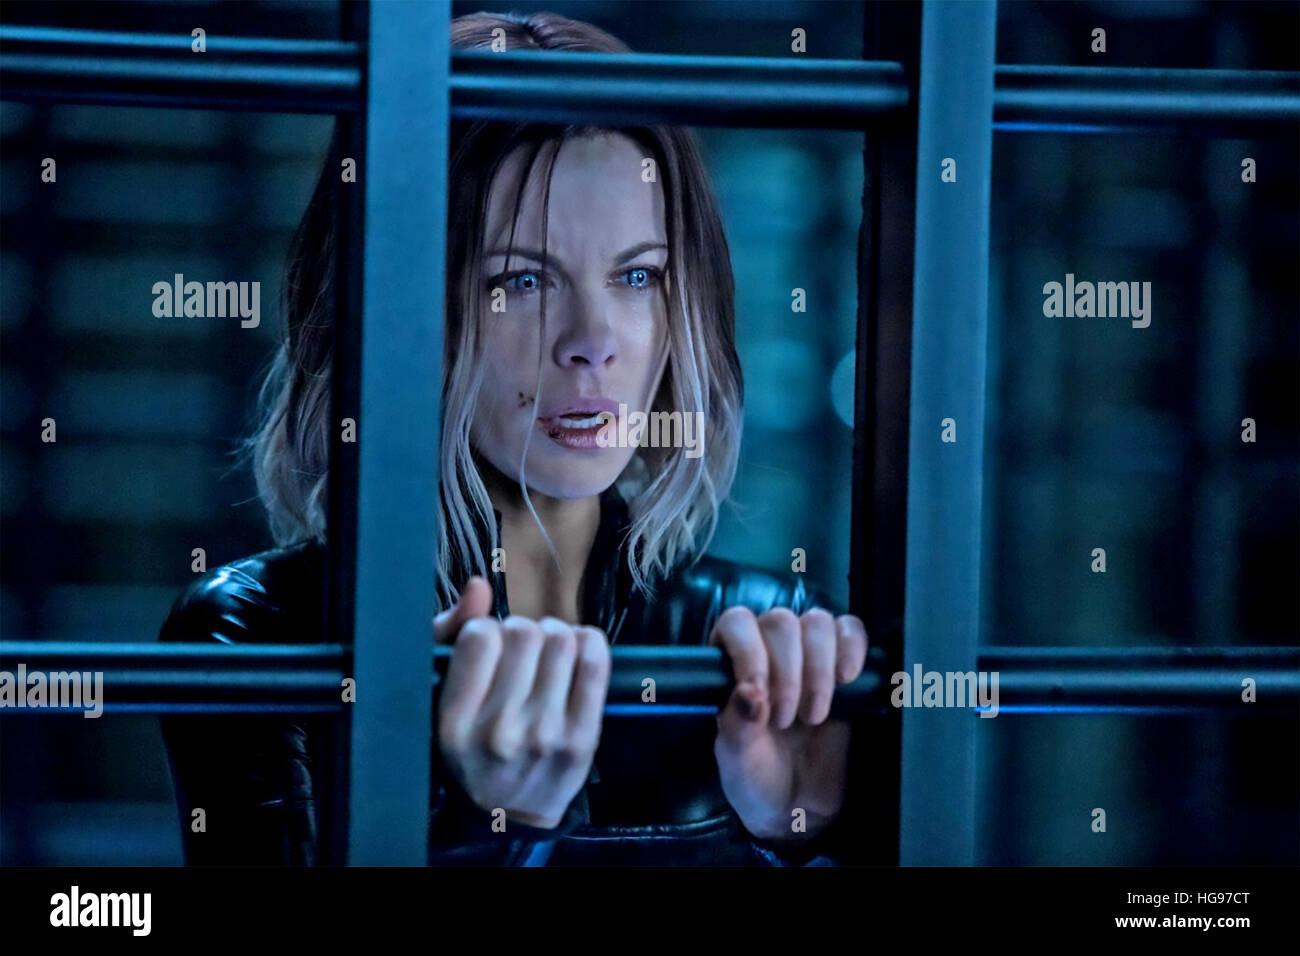 UNDERWORLD : BLOOD WARS 2016 Lakeshore Entertainment film with Kate Beckinsale - Stock Image